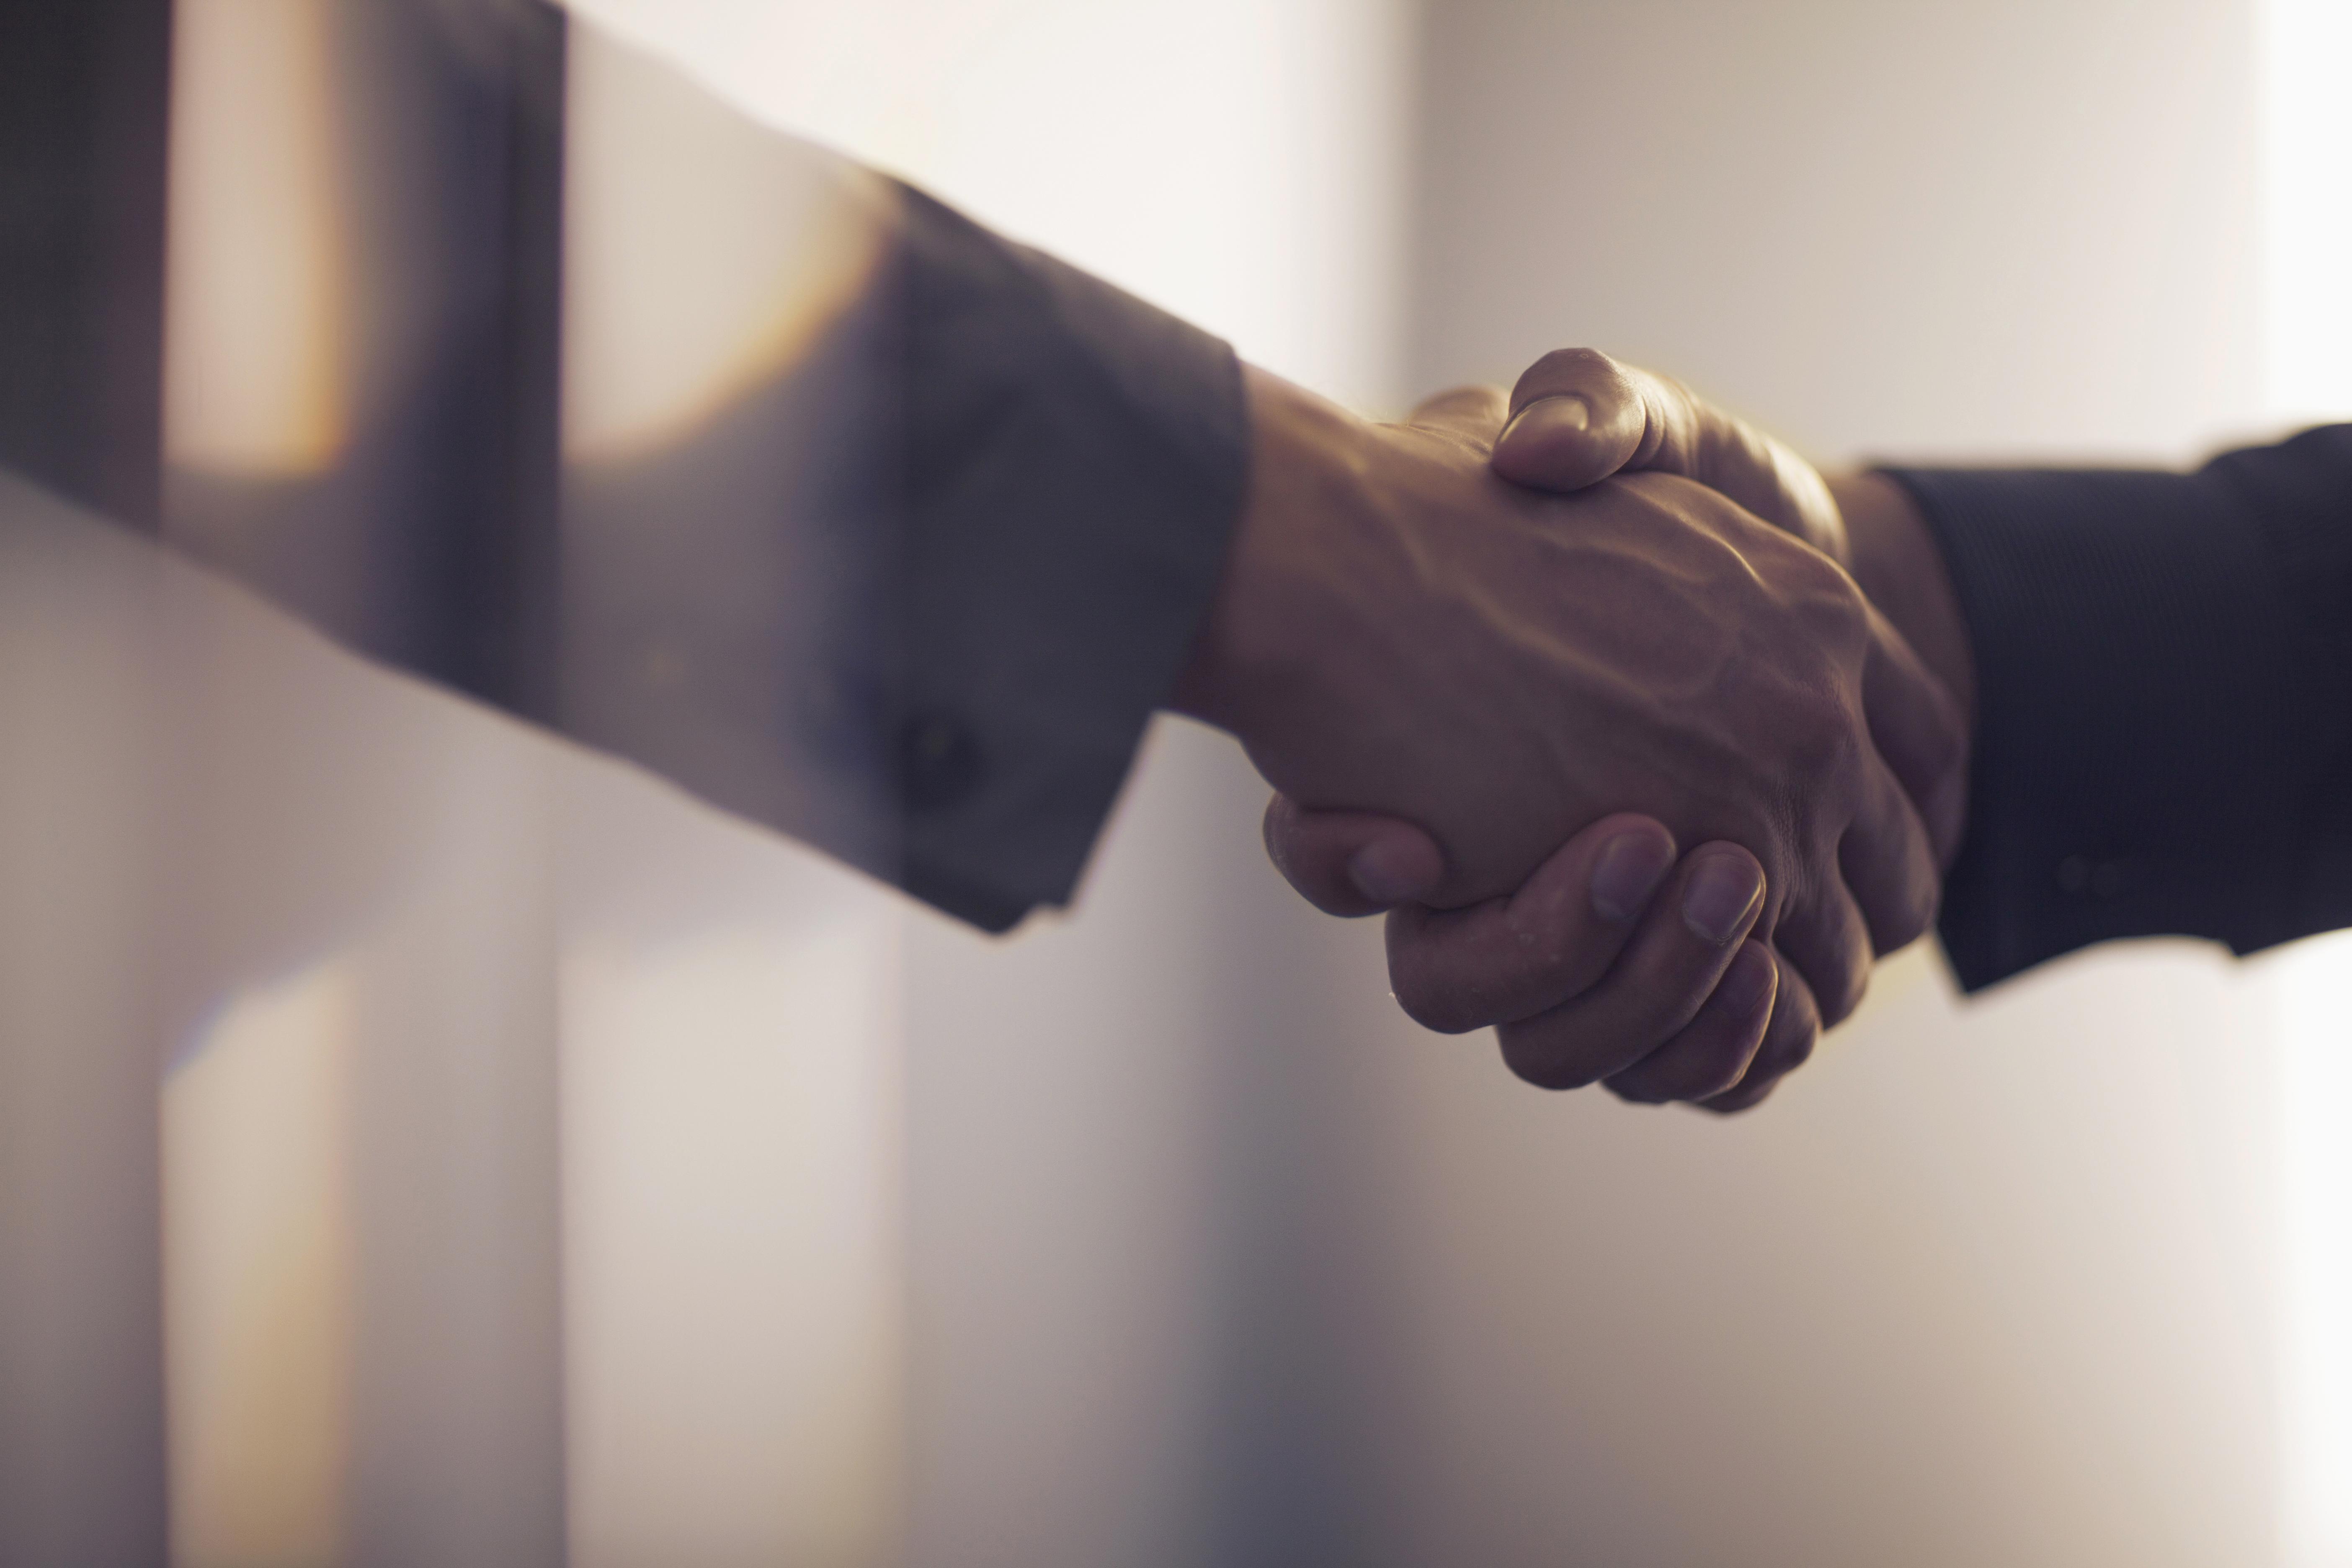 The Digital Workspace Alliance